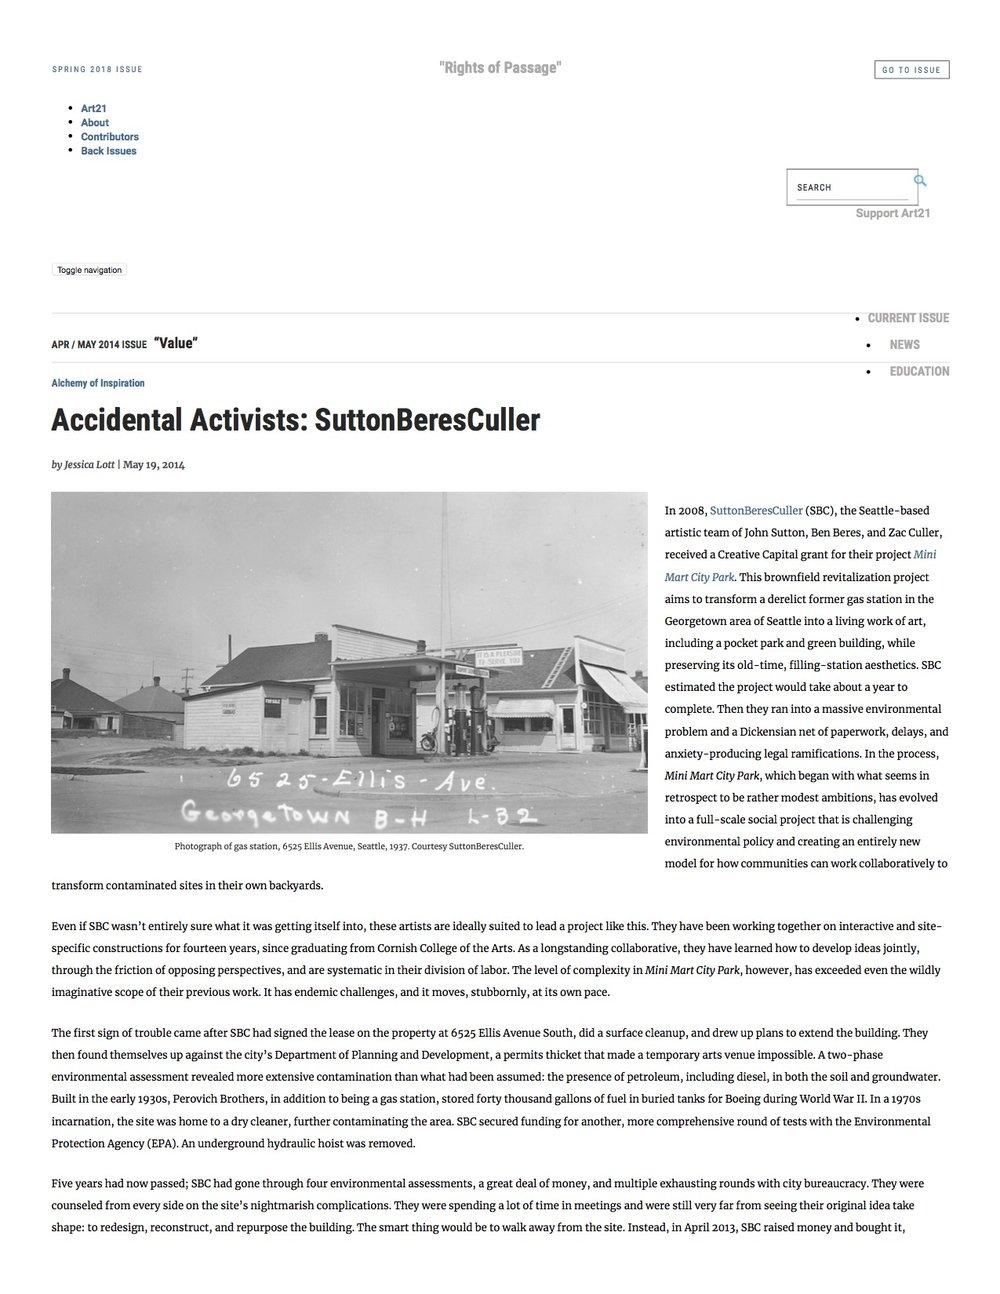 Accidental Activists_ SuttonBeresCuller _ Art21 Magazine pg1.jpg